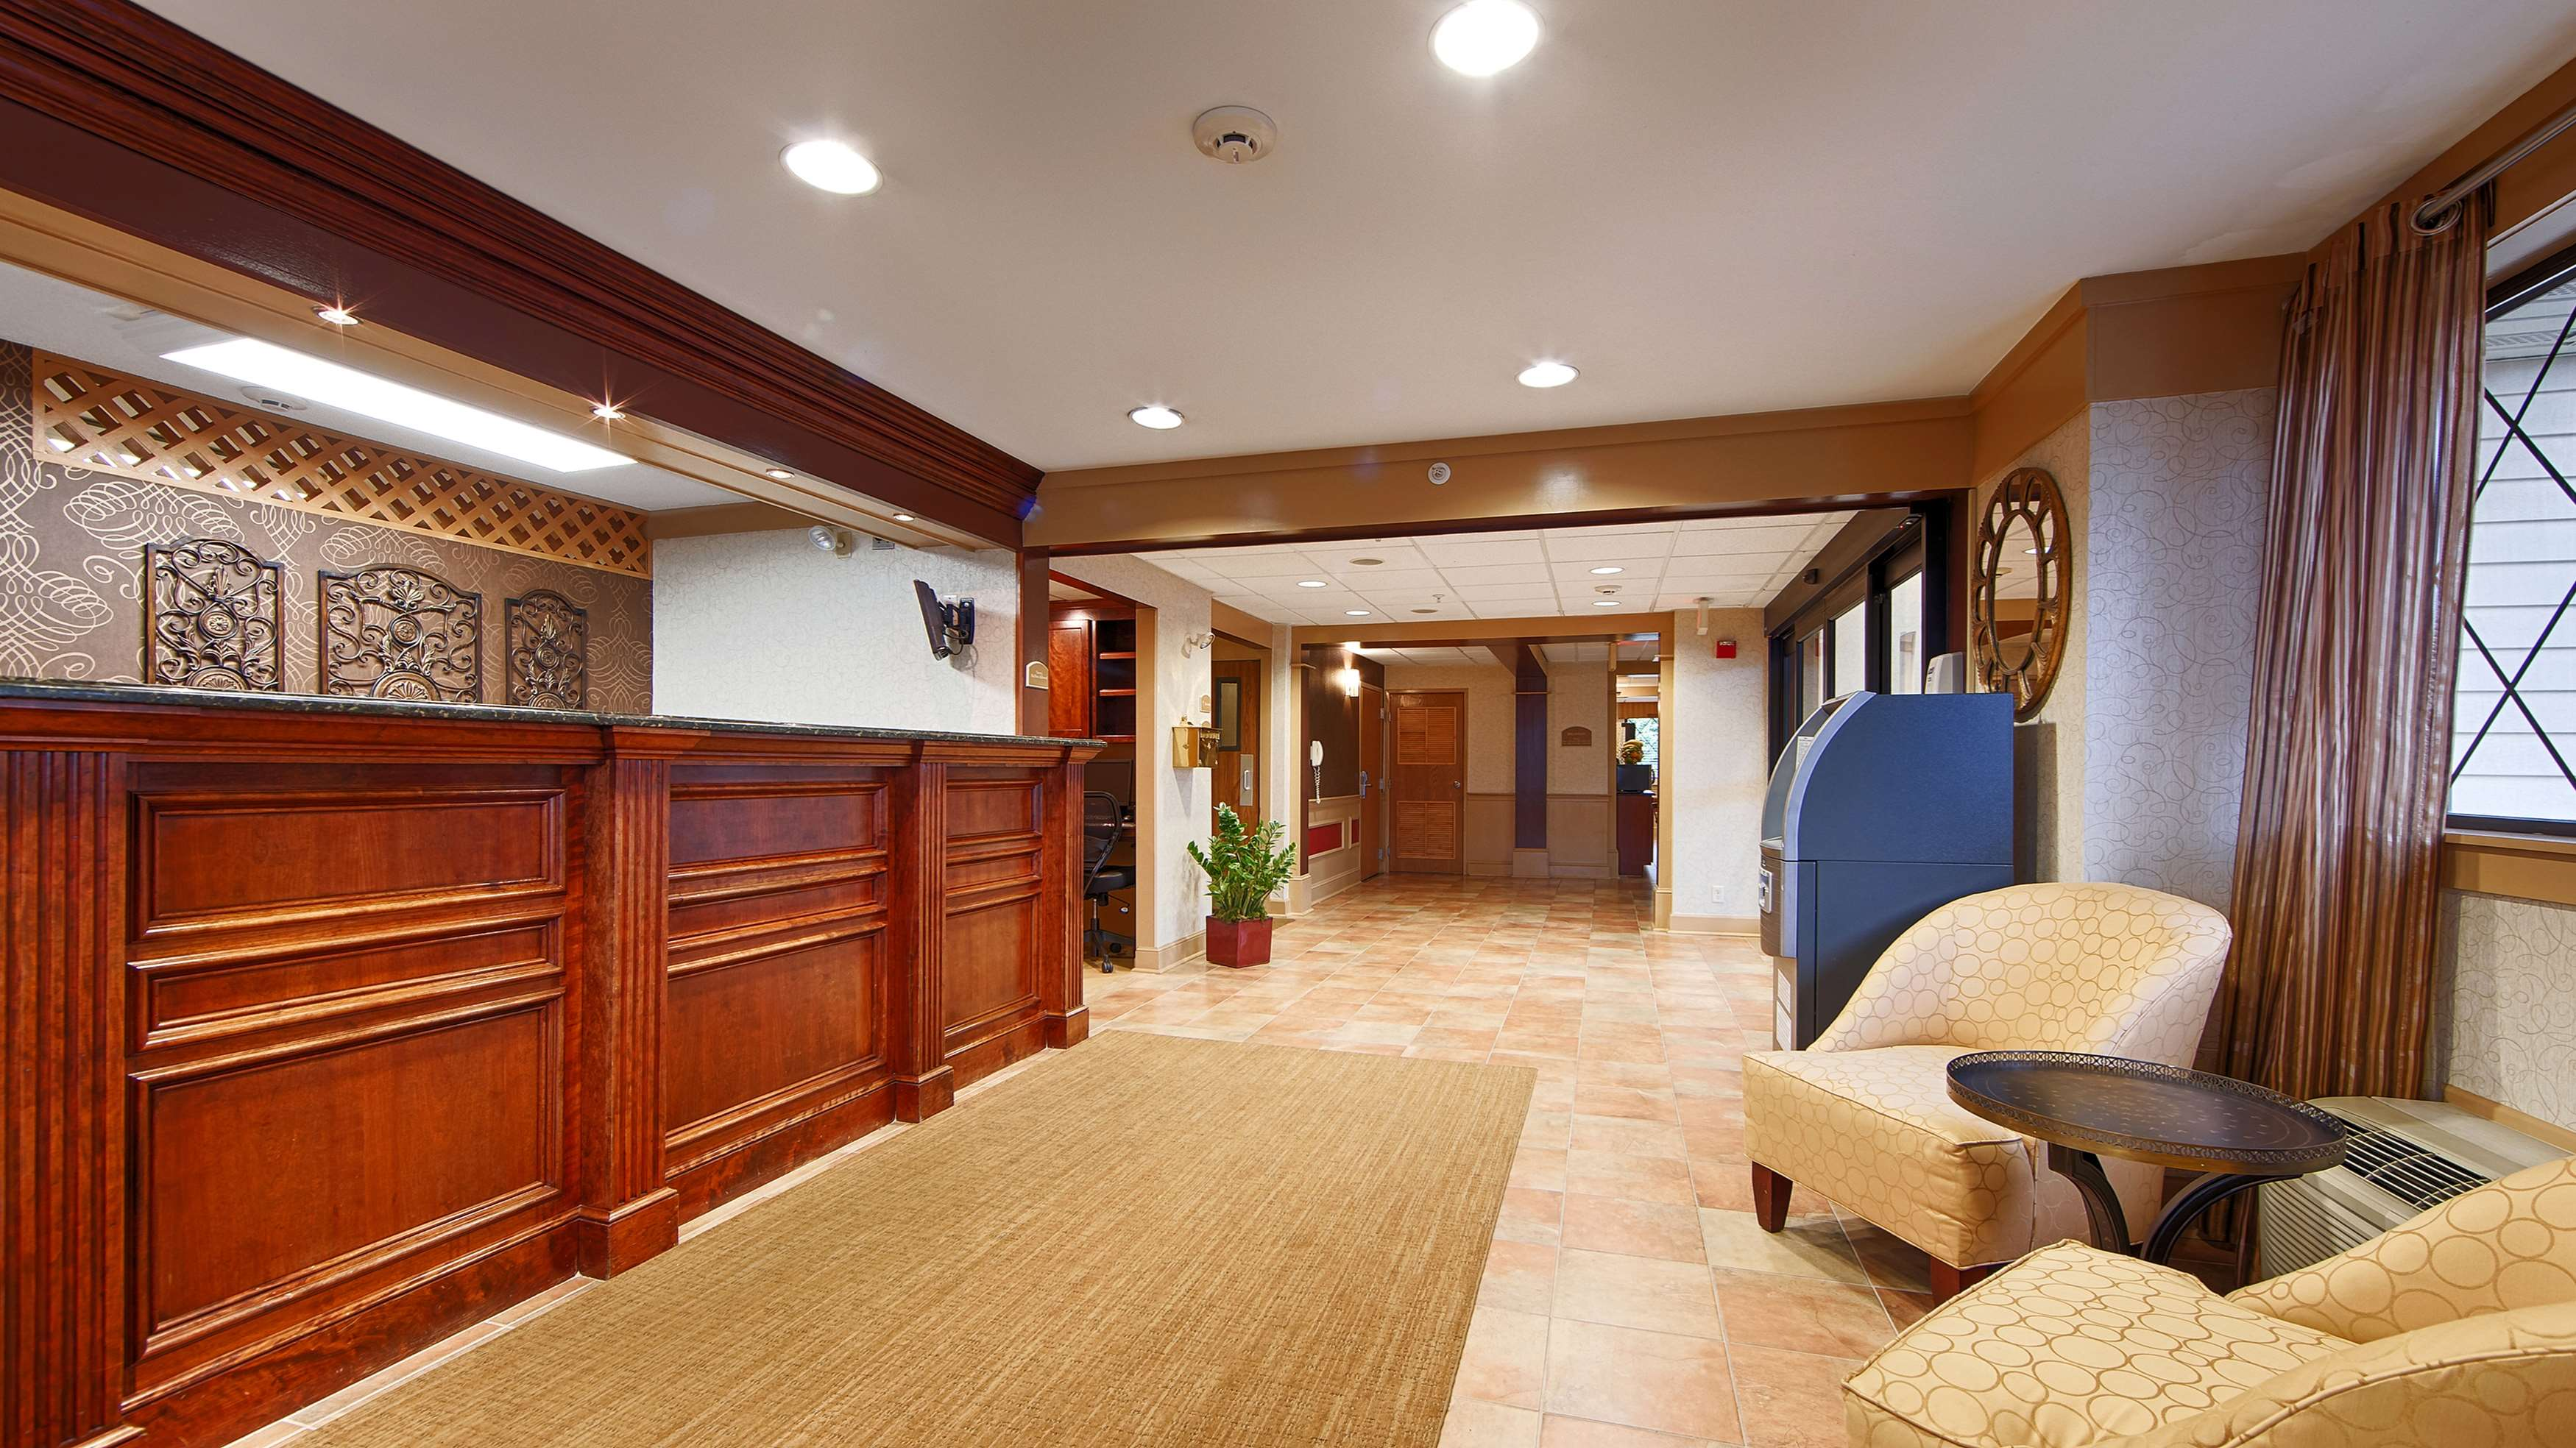 Best Western Plus The Inn at Sharon/Foxboro image 2